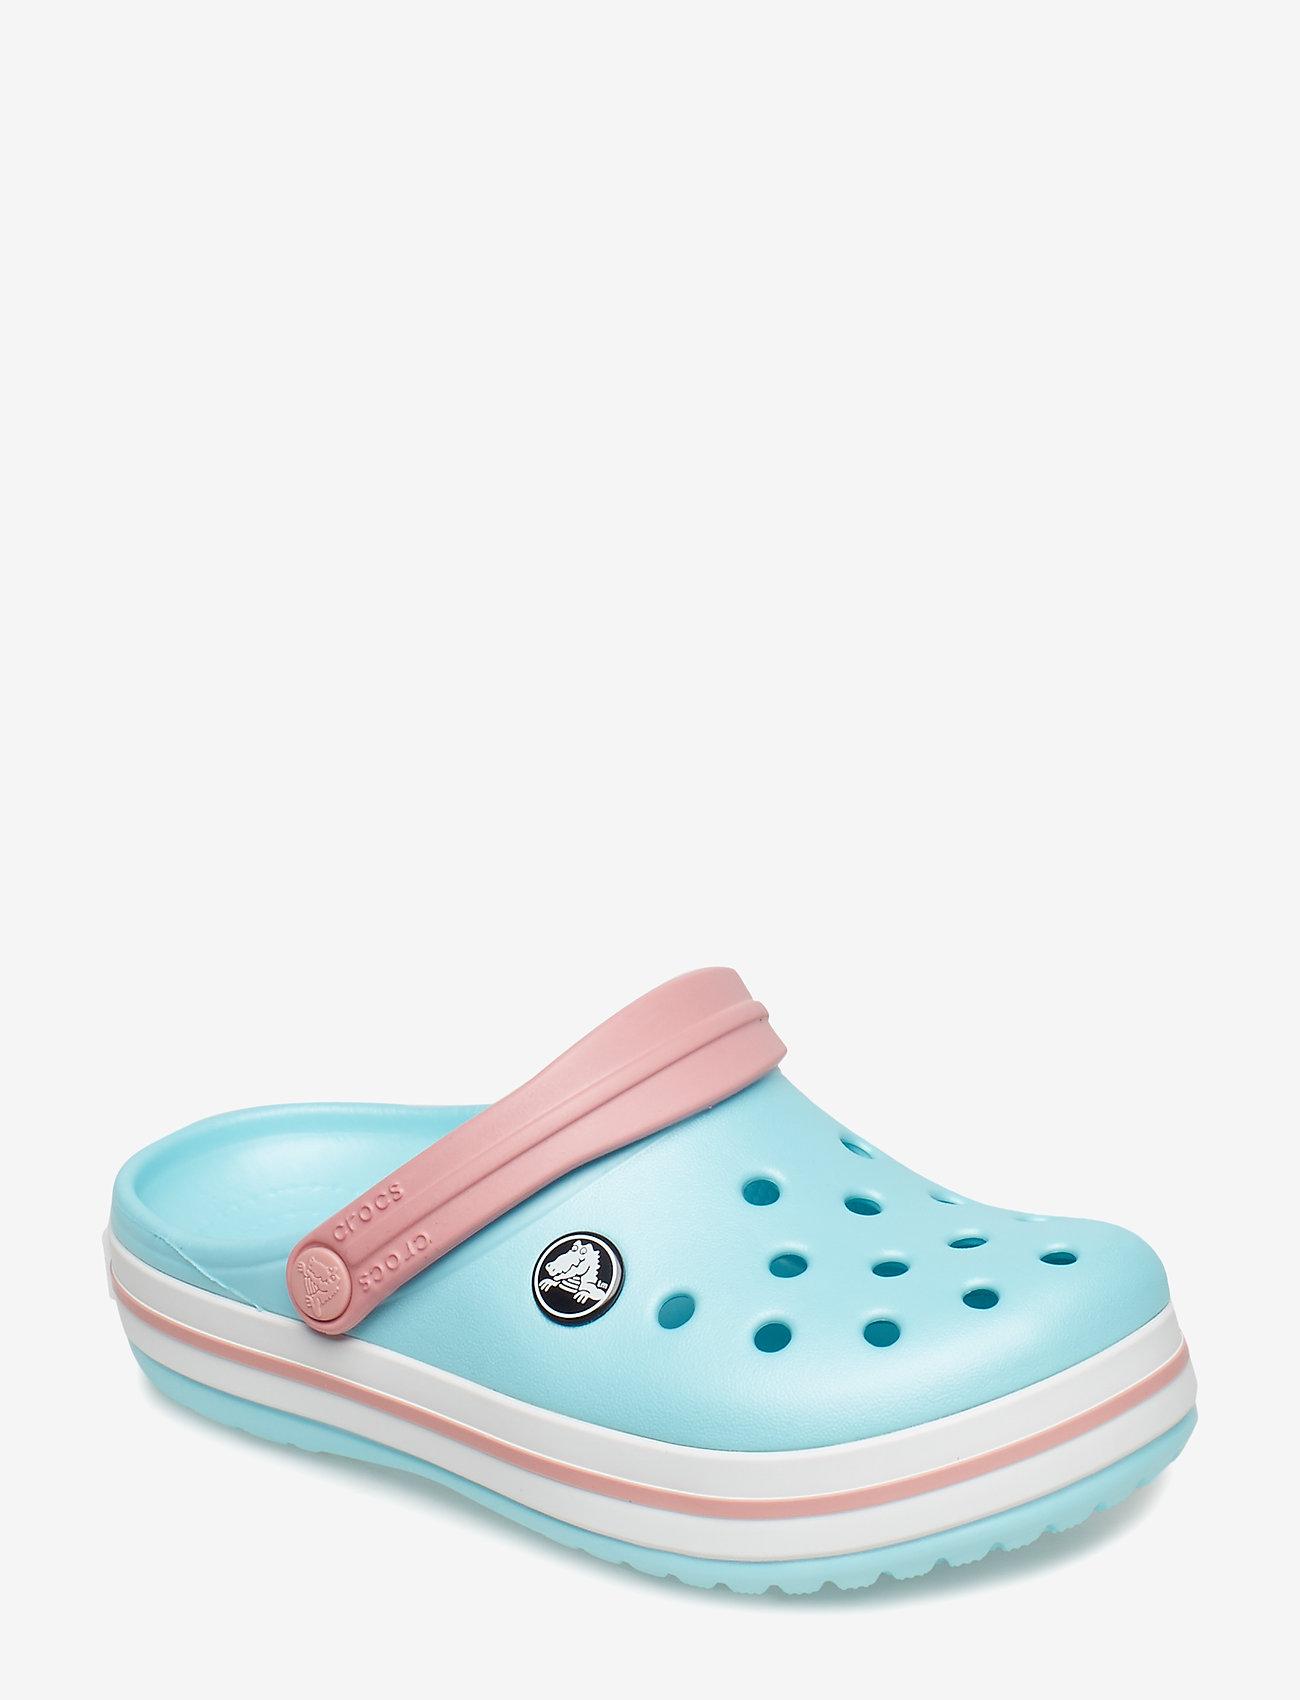 Crocs - Crocband Clog K - ice blue/white - 0